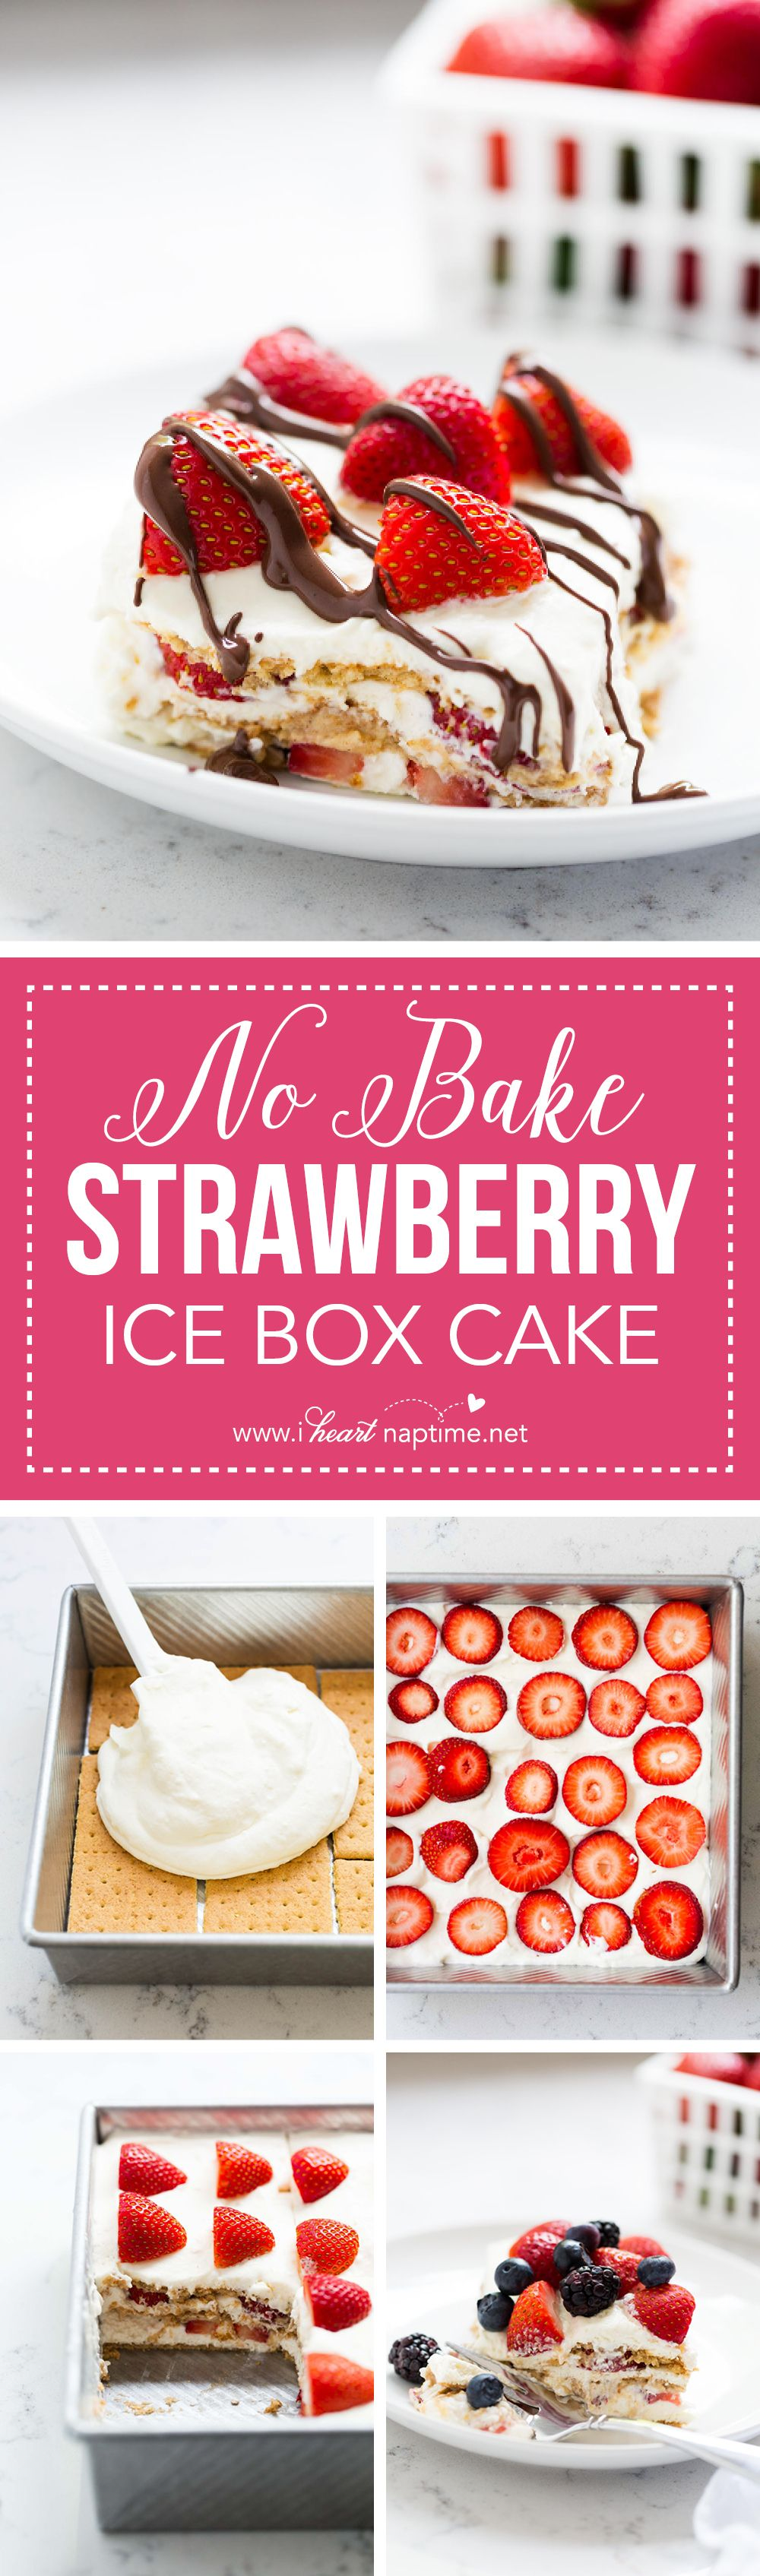 Save this easy dessert recipes to make a No Bake Strawberry Ice Box Cake.